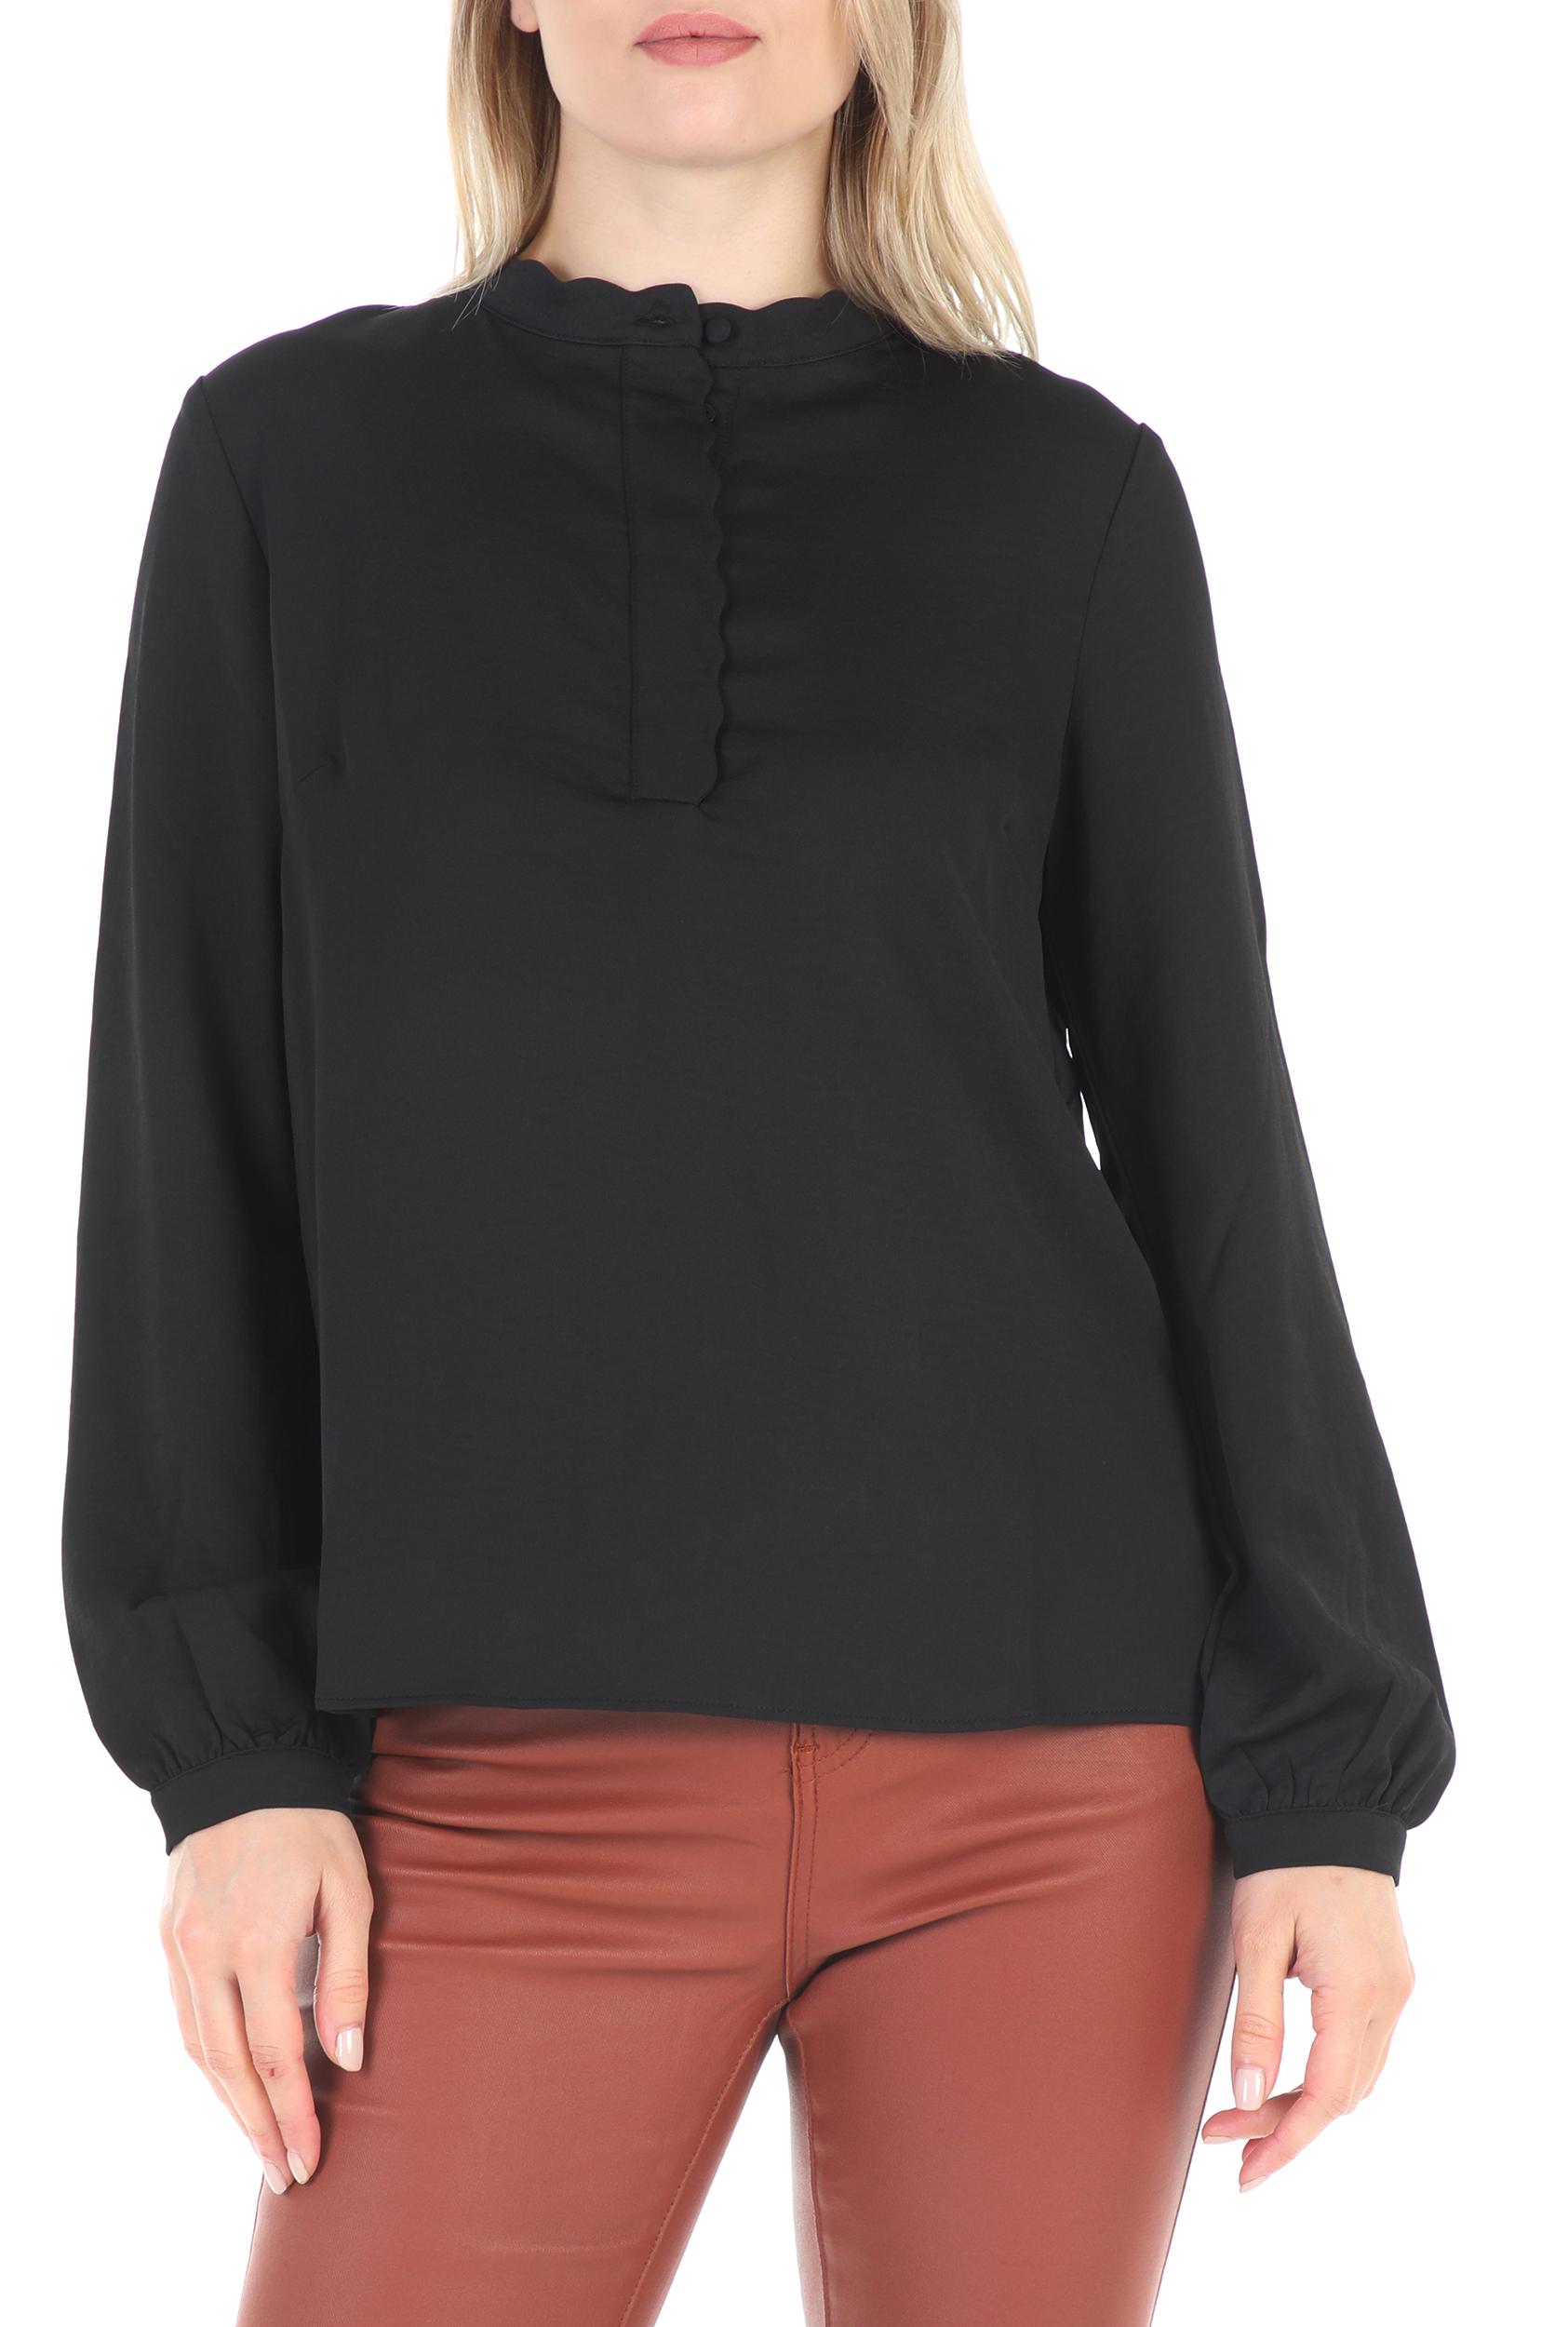 MOLLY BRACKEN - Γυναικεία μπλούζα MOLLY BRACKEN μαύρη